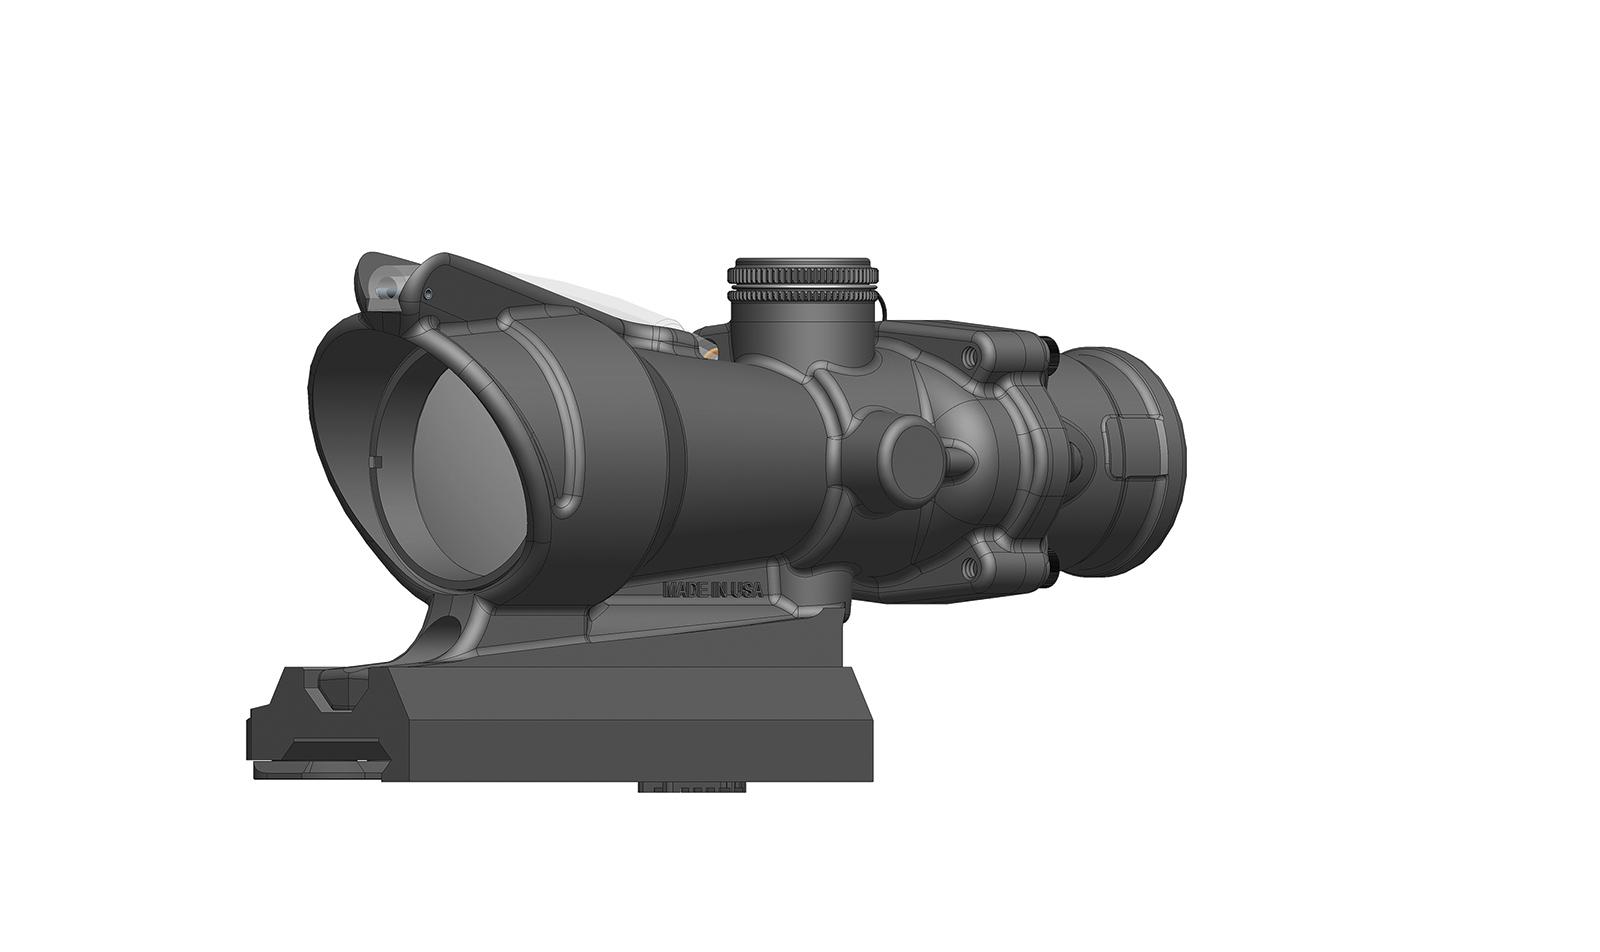 TA31-D-100582 angle 1